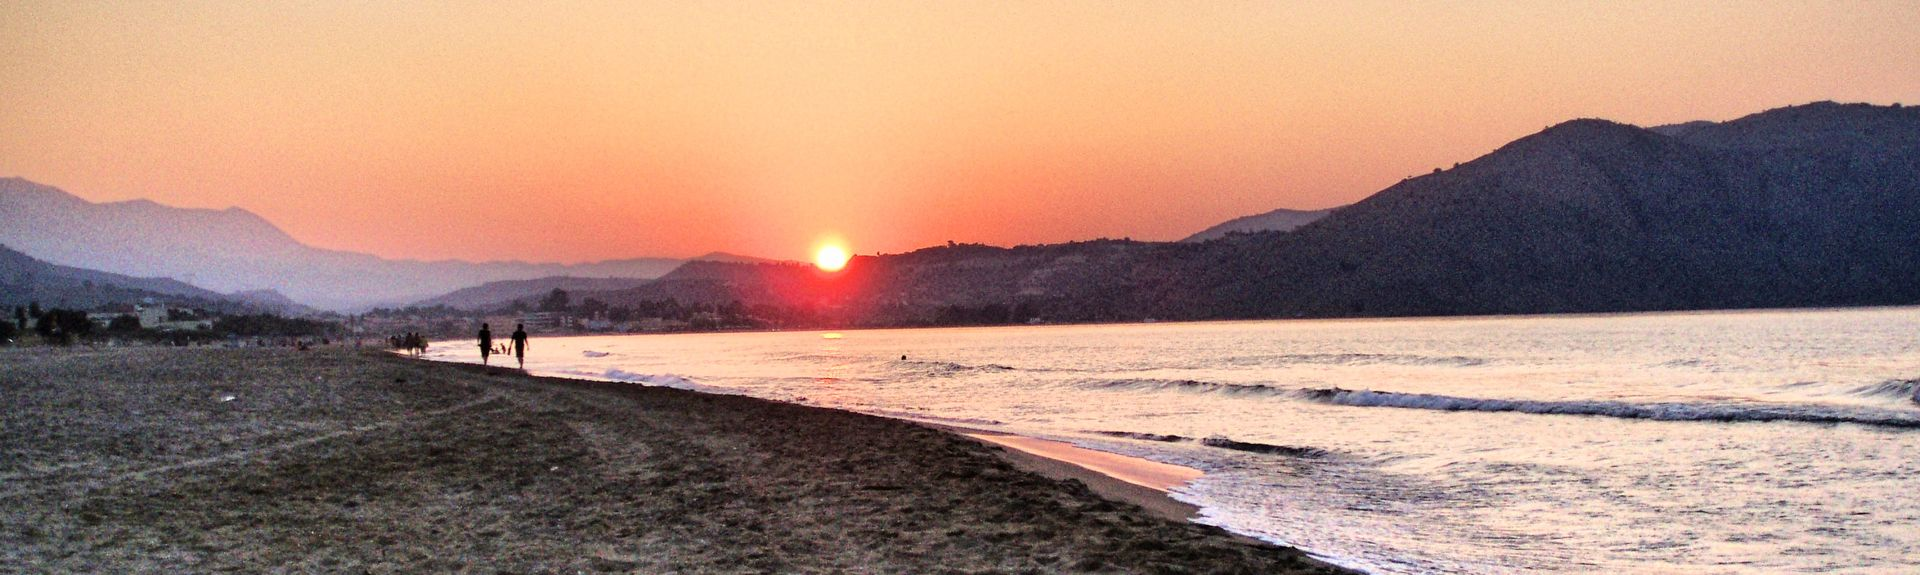 Impros, Greece